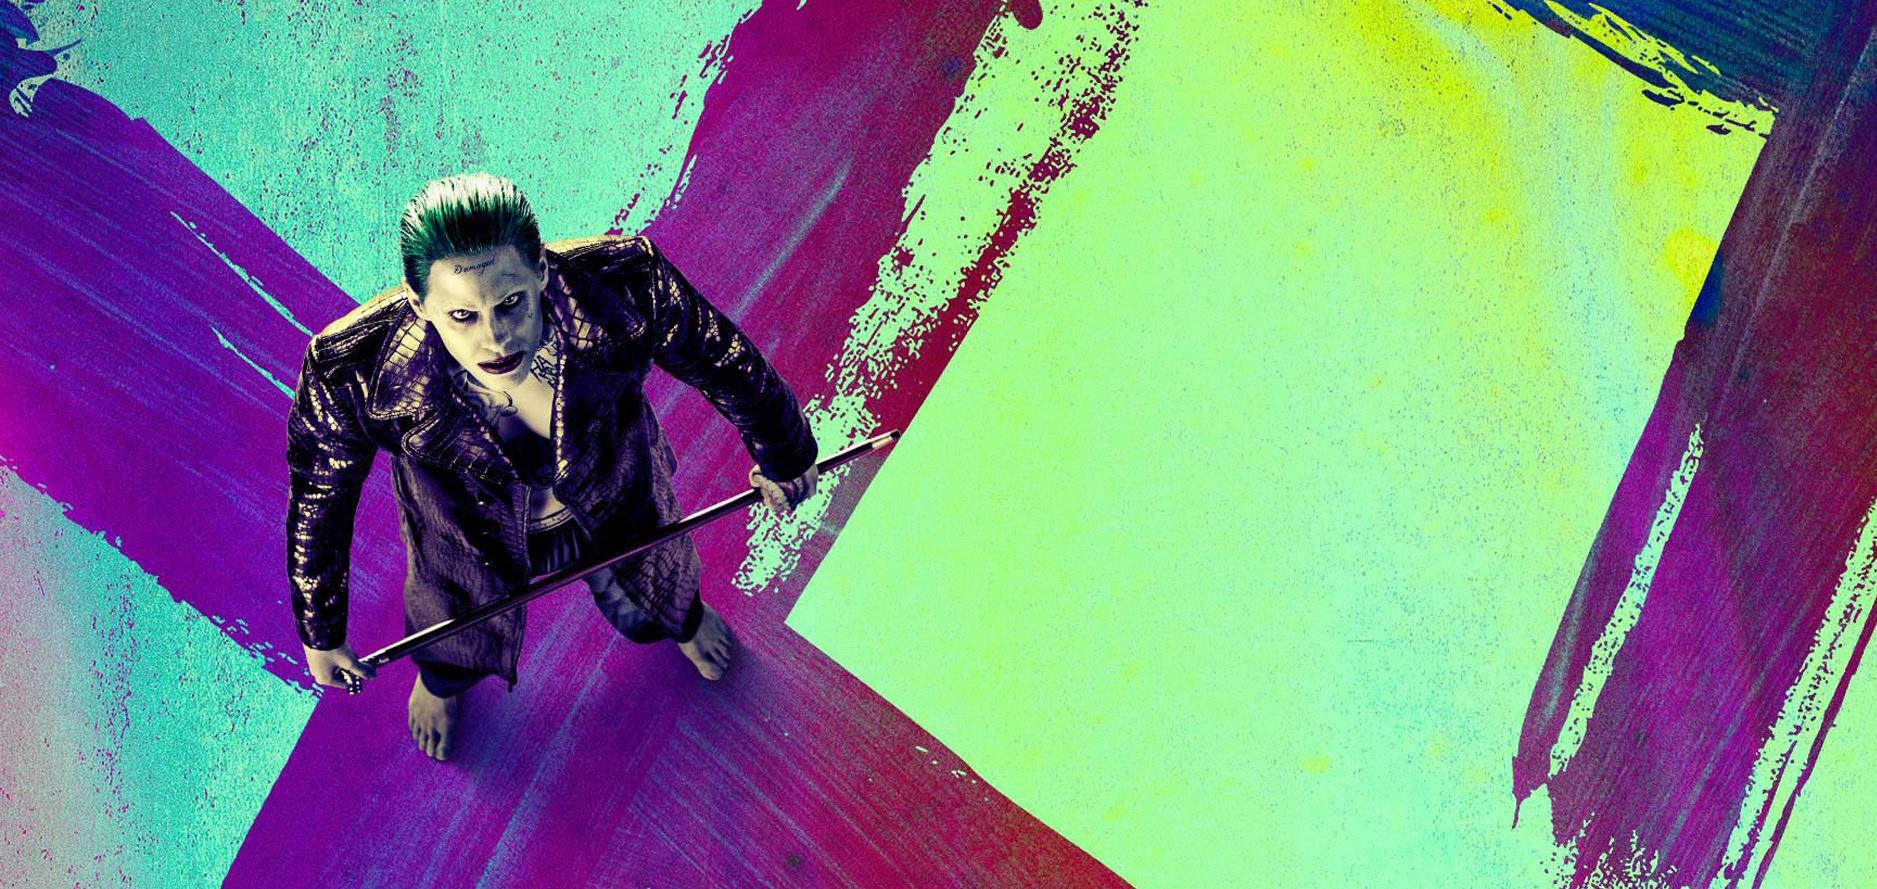 Suicide Squad-Joker-Poster